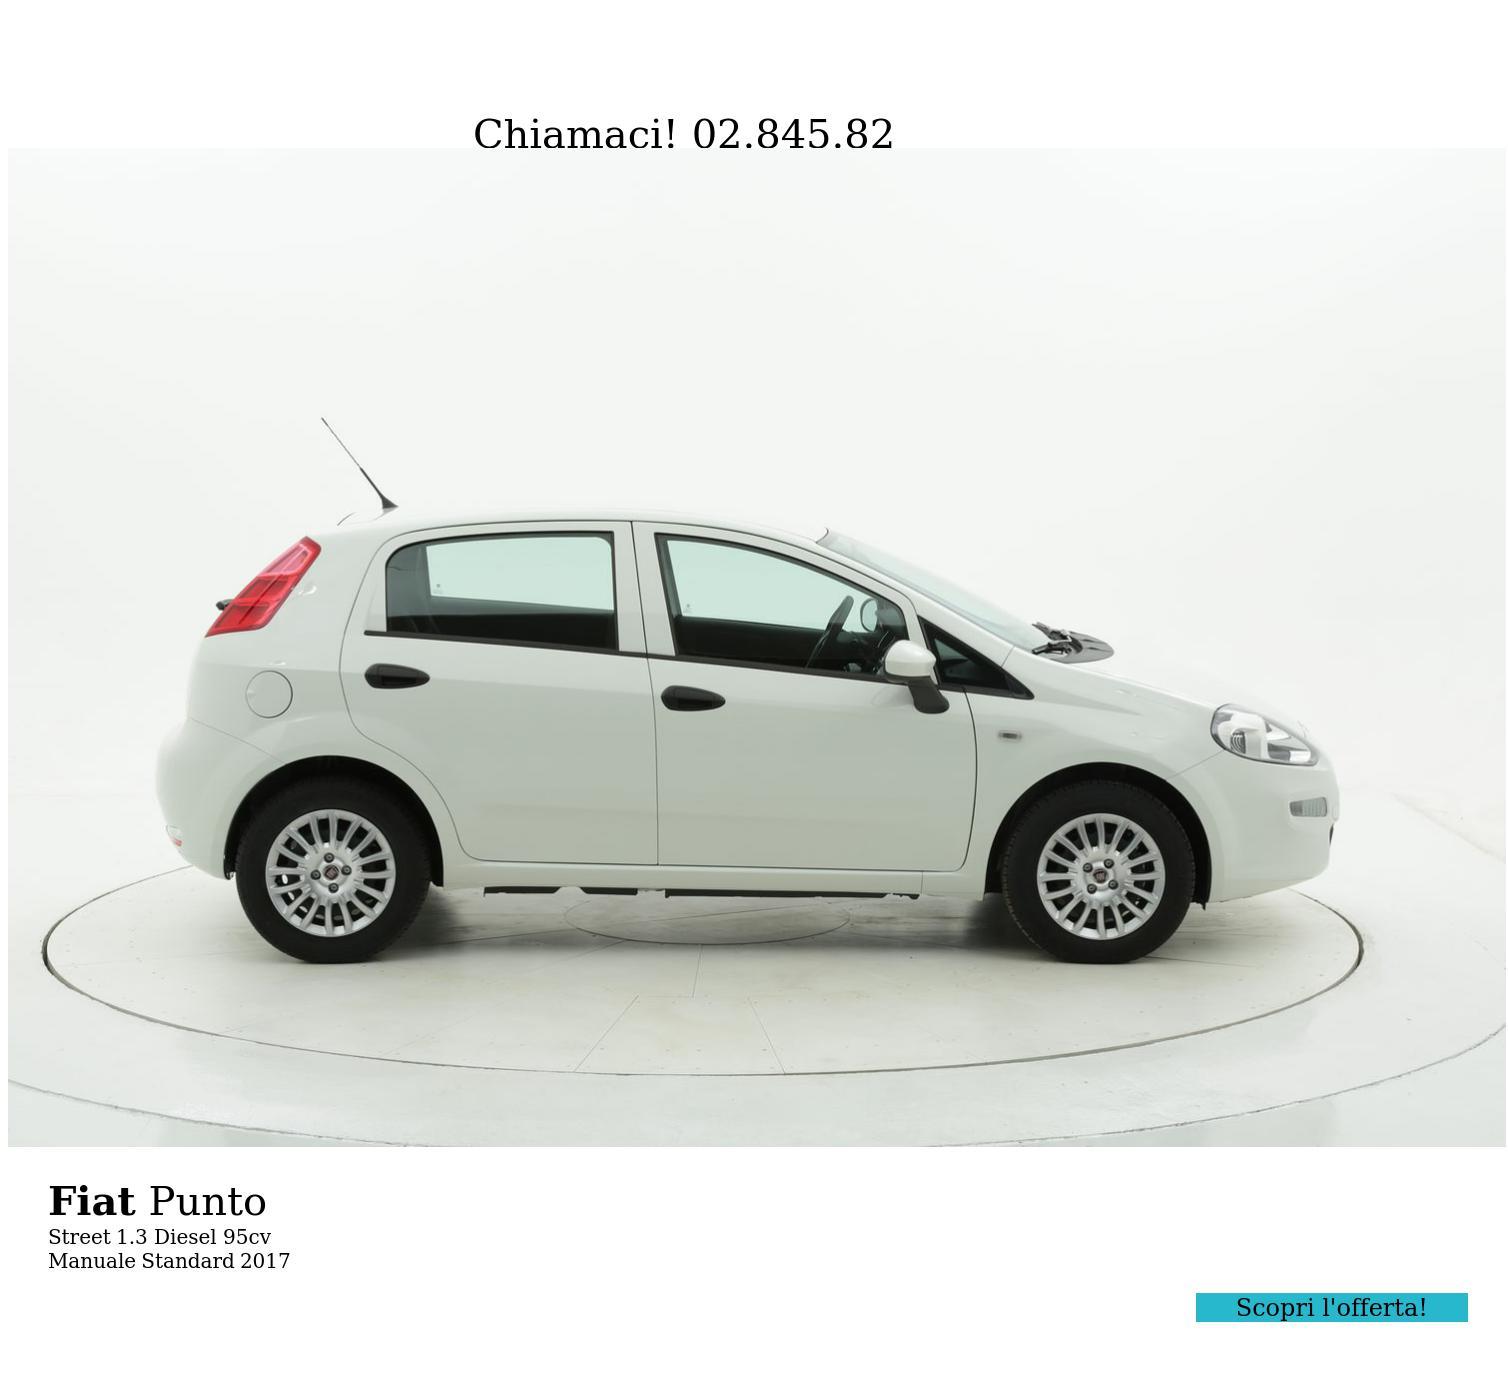 Fiat Punto Street km 0 diesel bianca   brumbrum